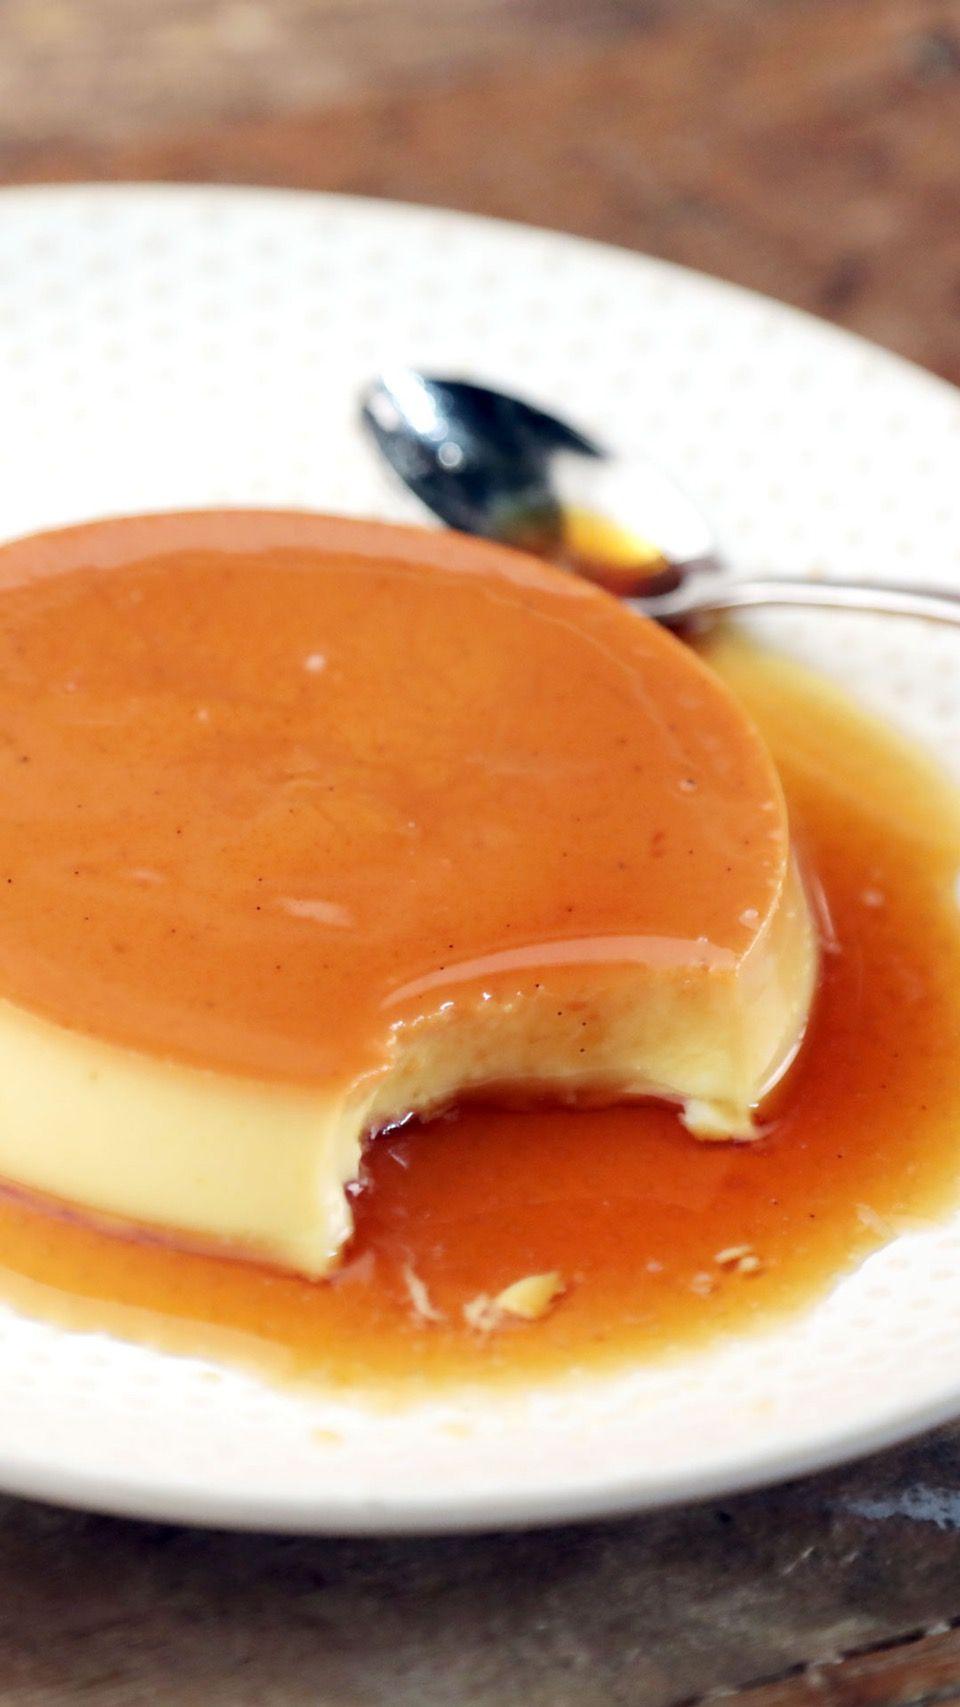 Escoffier S Caramel Cream Recipe Tastemade Recipes Caramel Cream Recipe Food